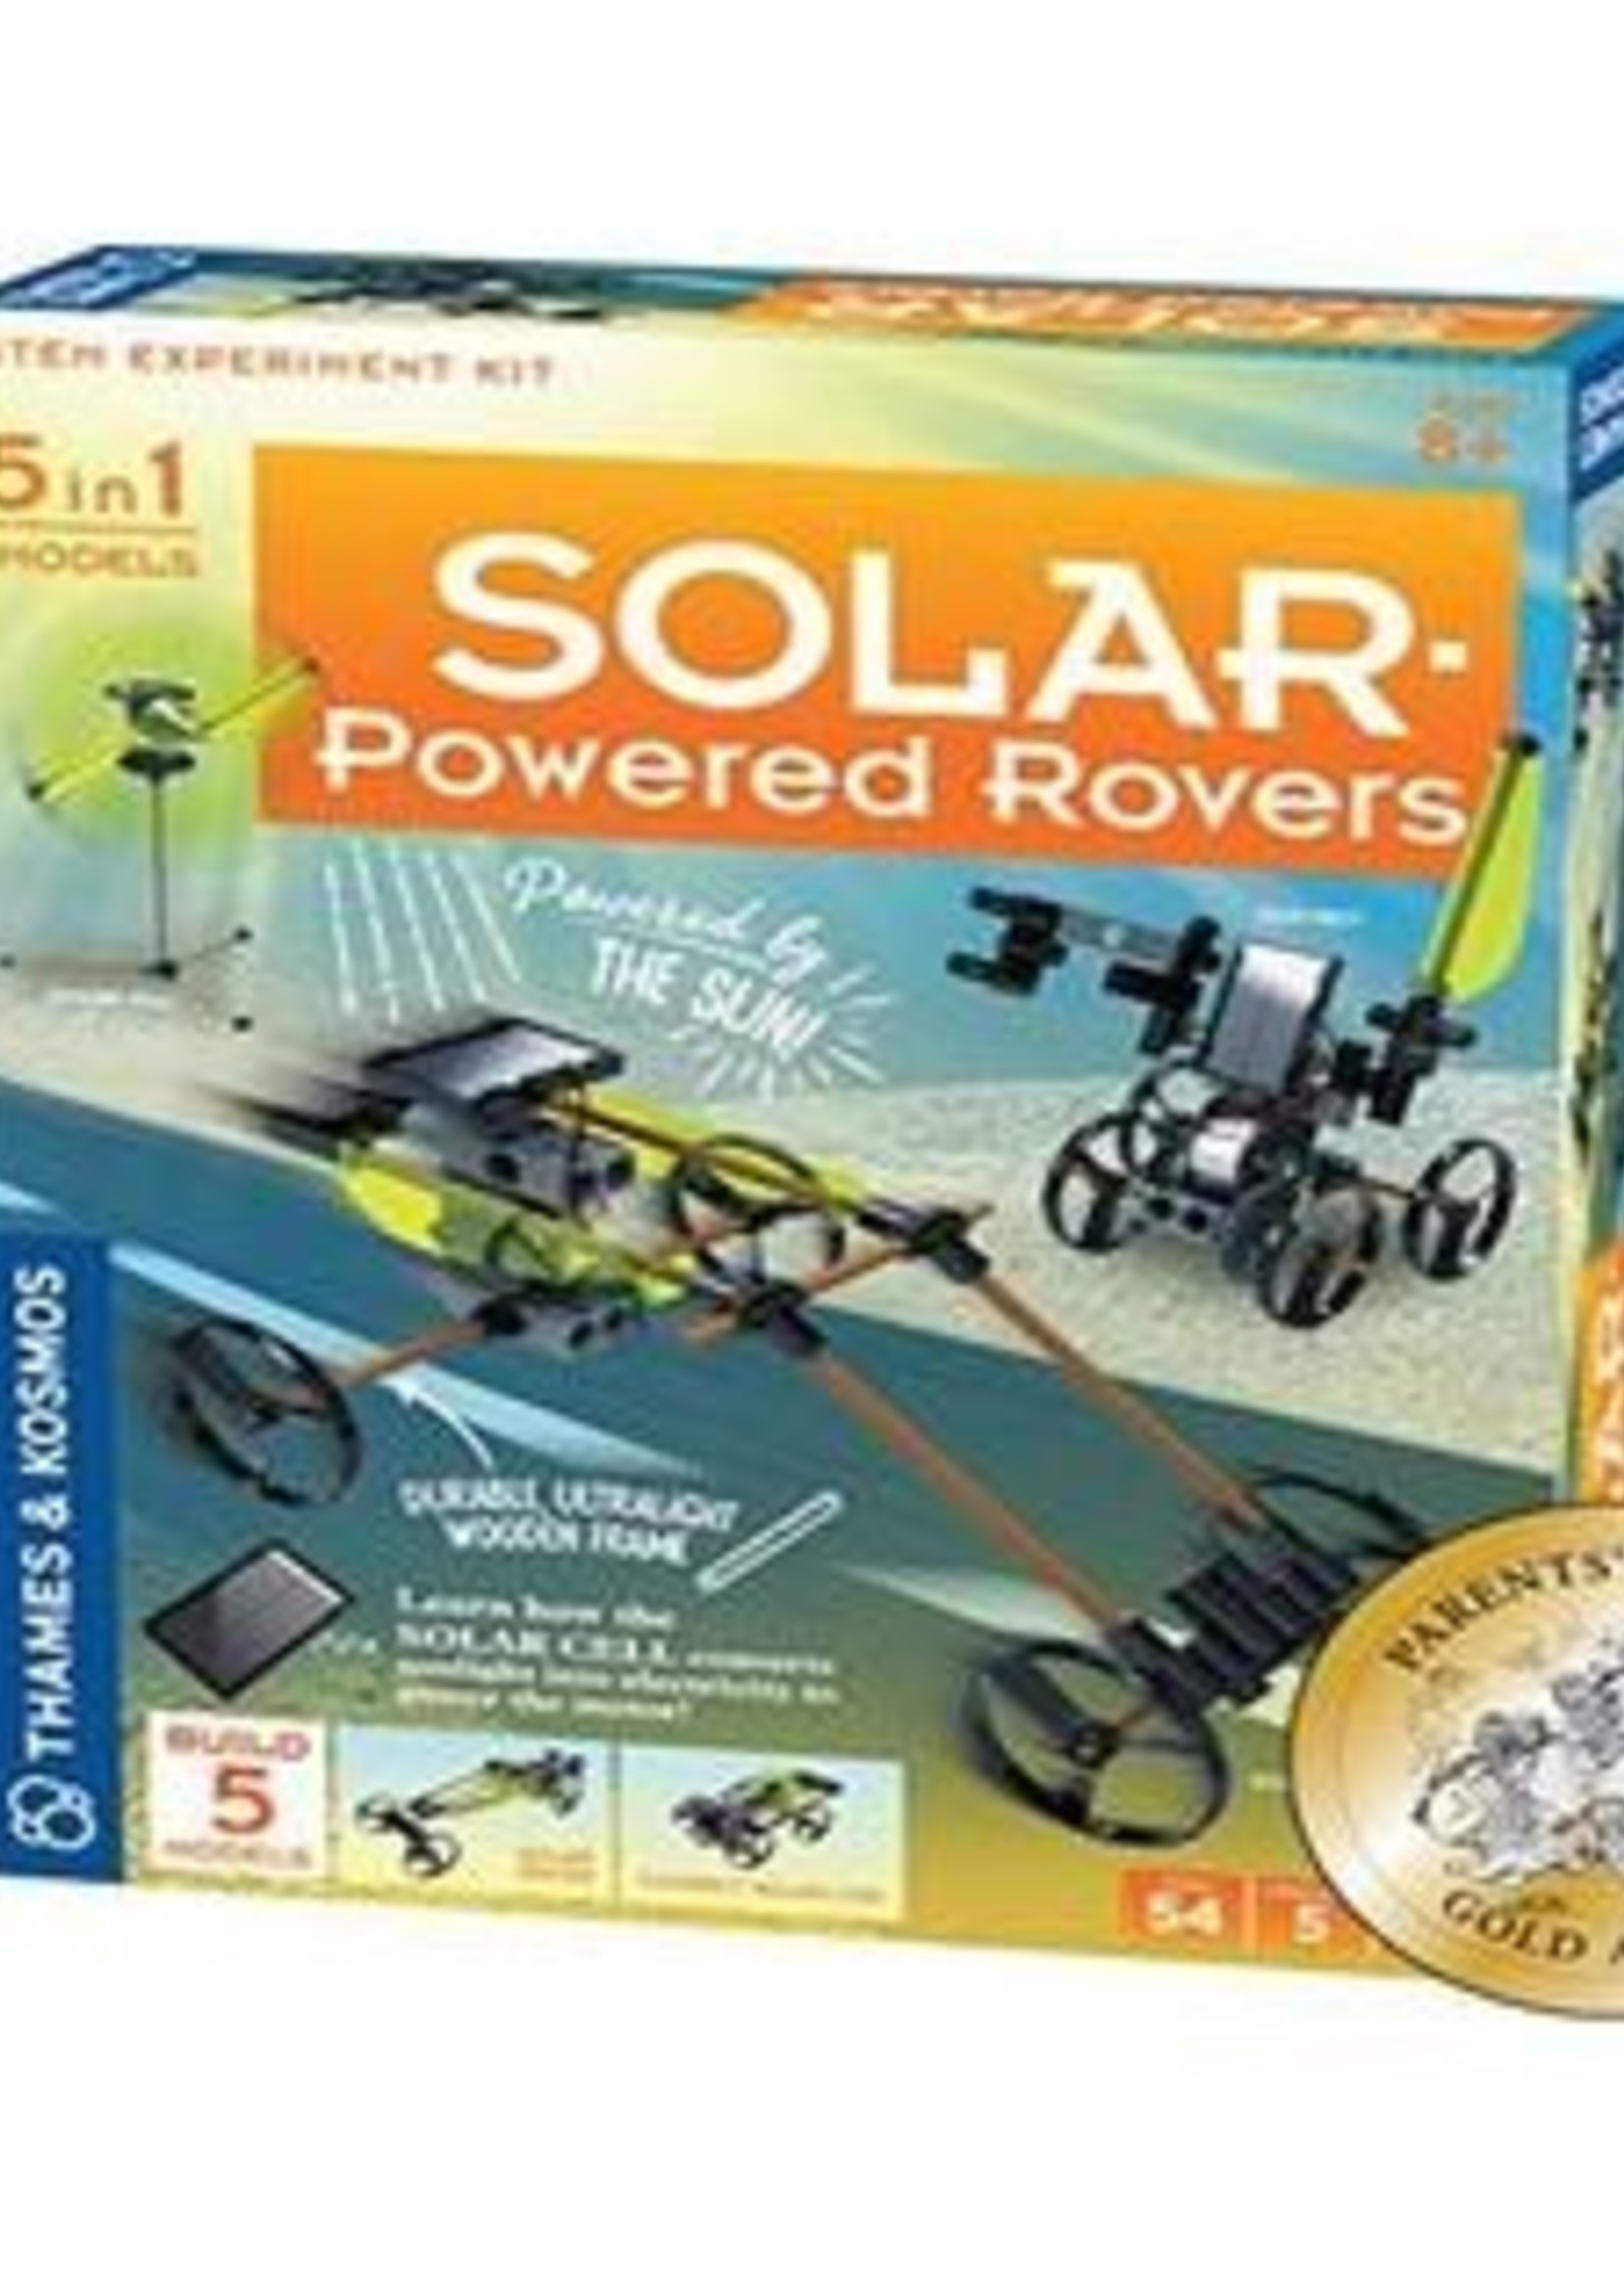 Solar Powered Rover